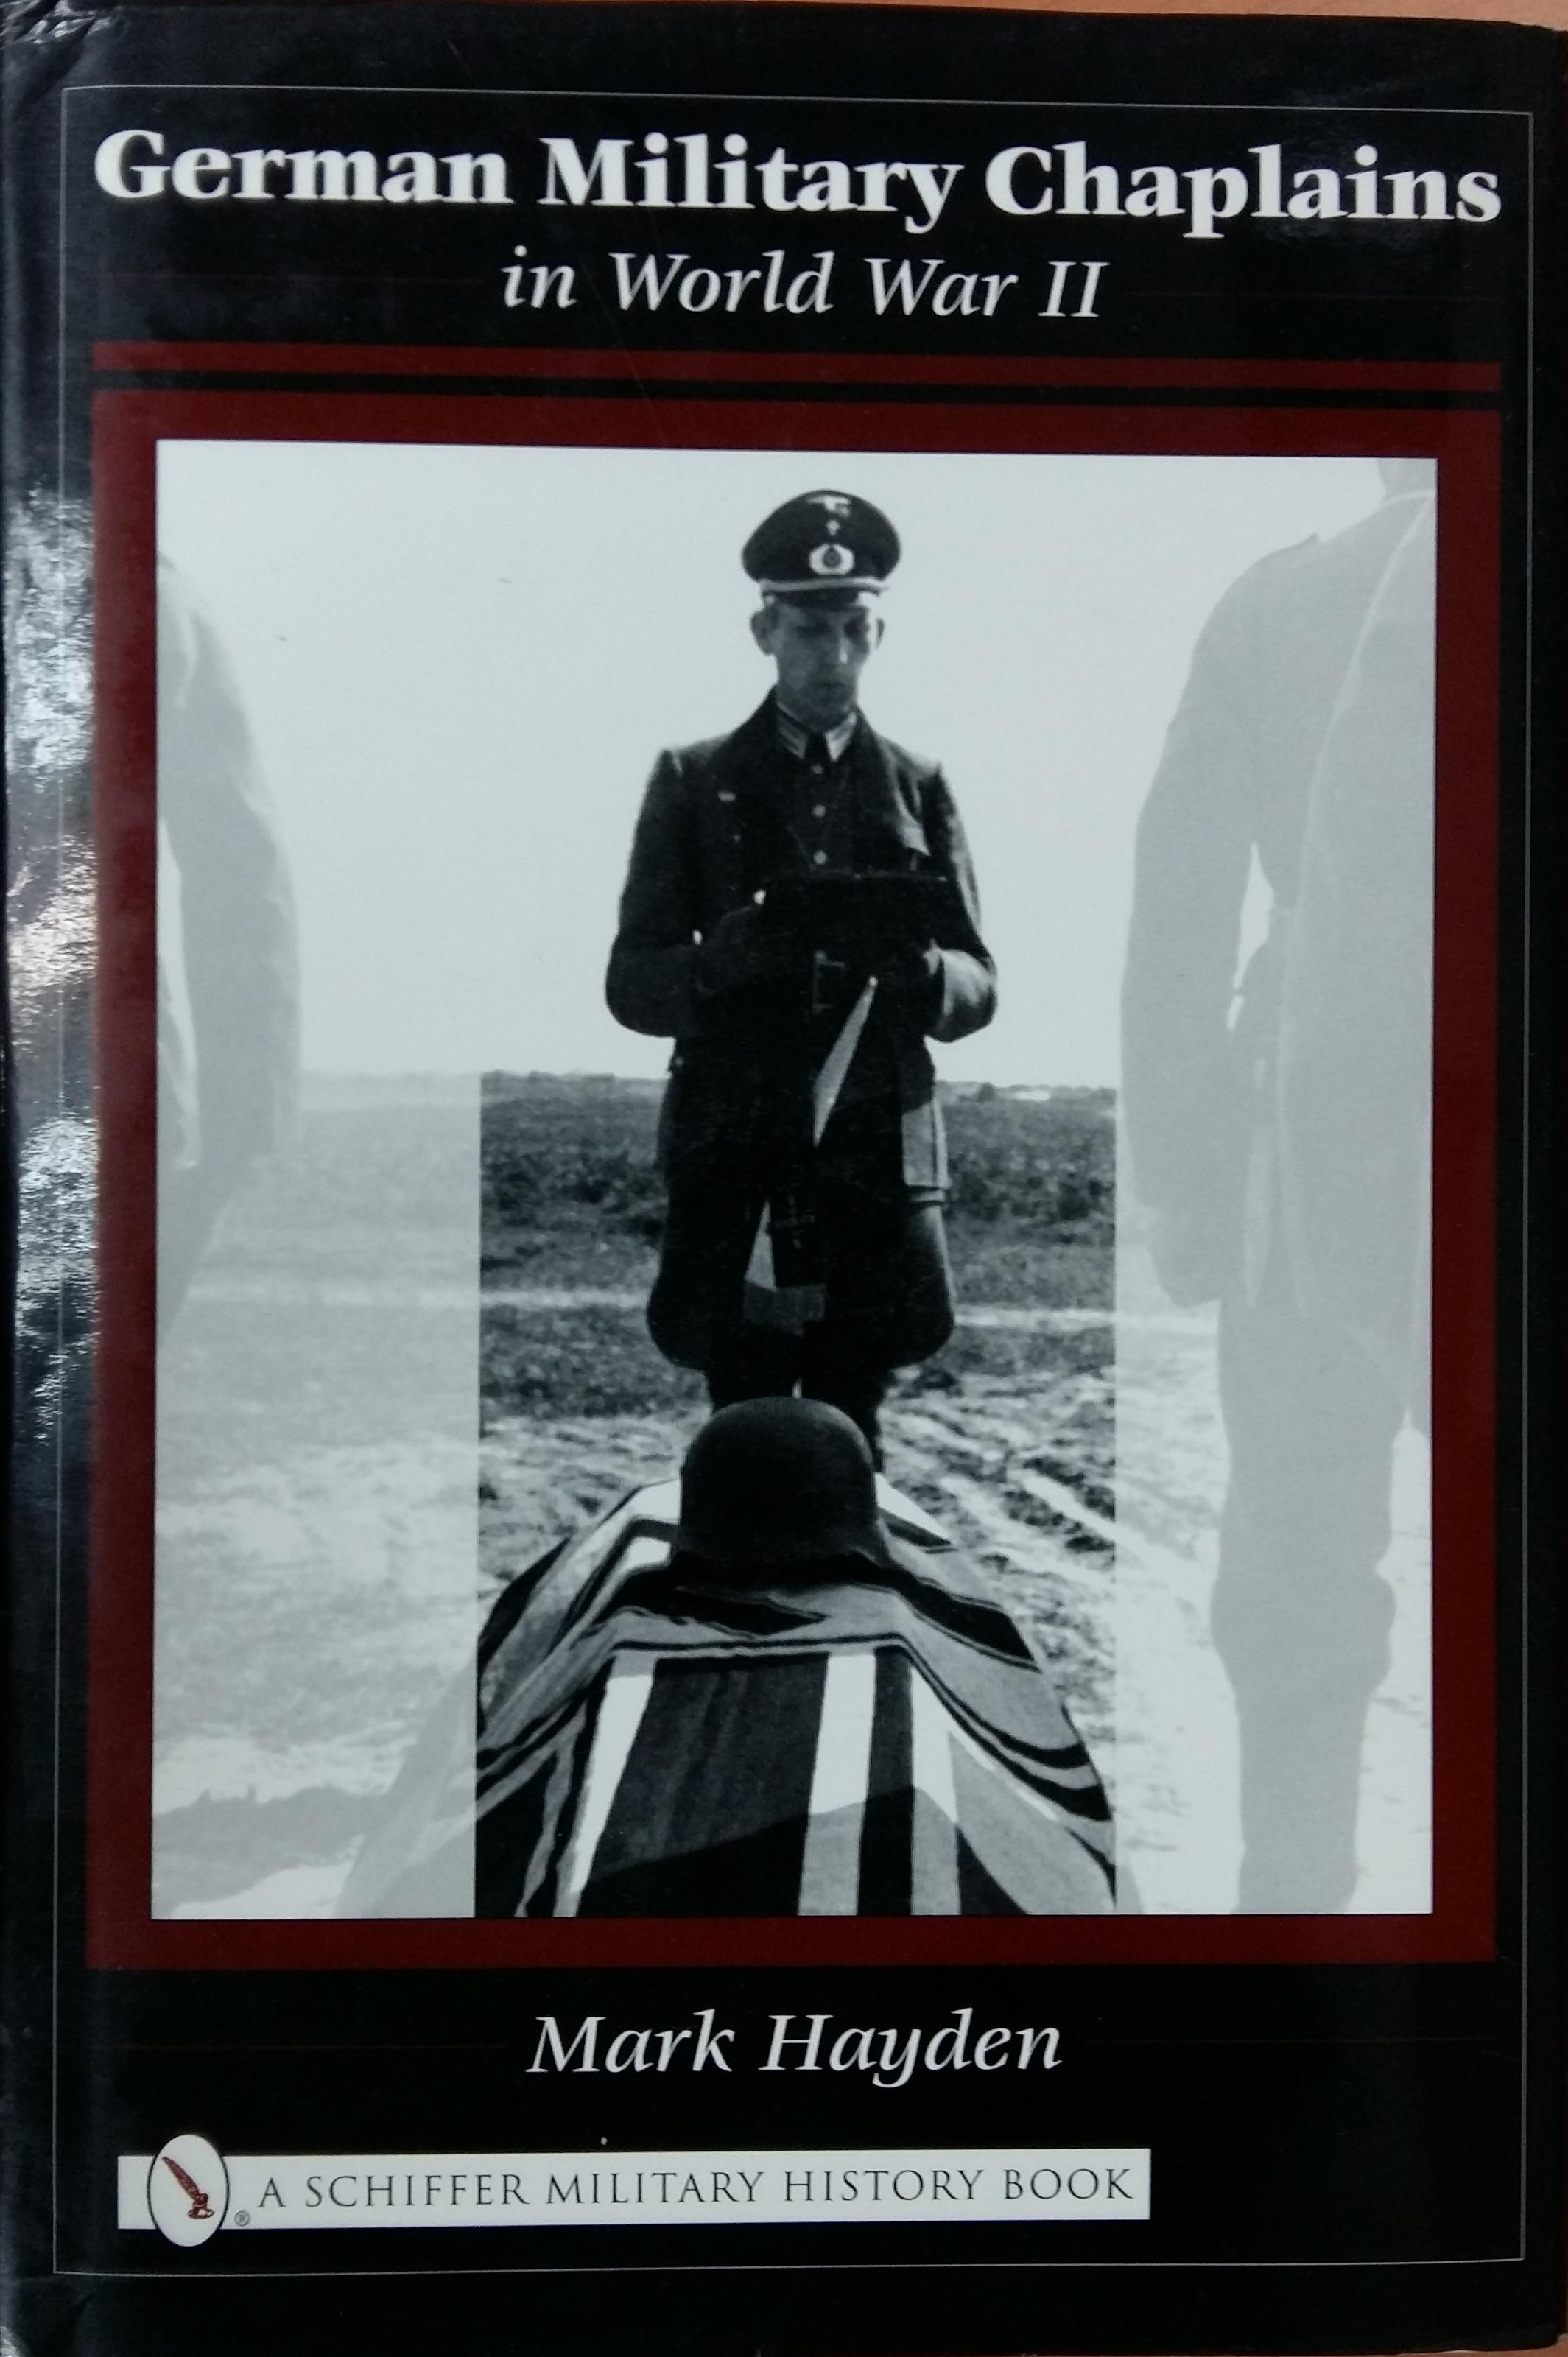 Hayden-Mark-German-Military-Chaplain-WW2.jpg